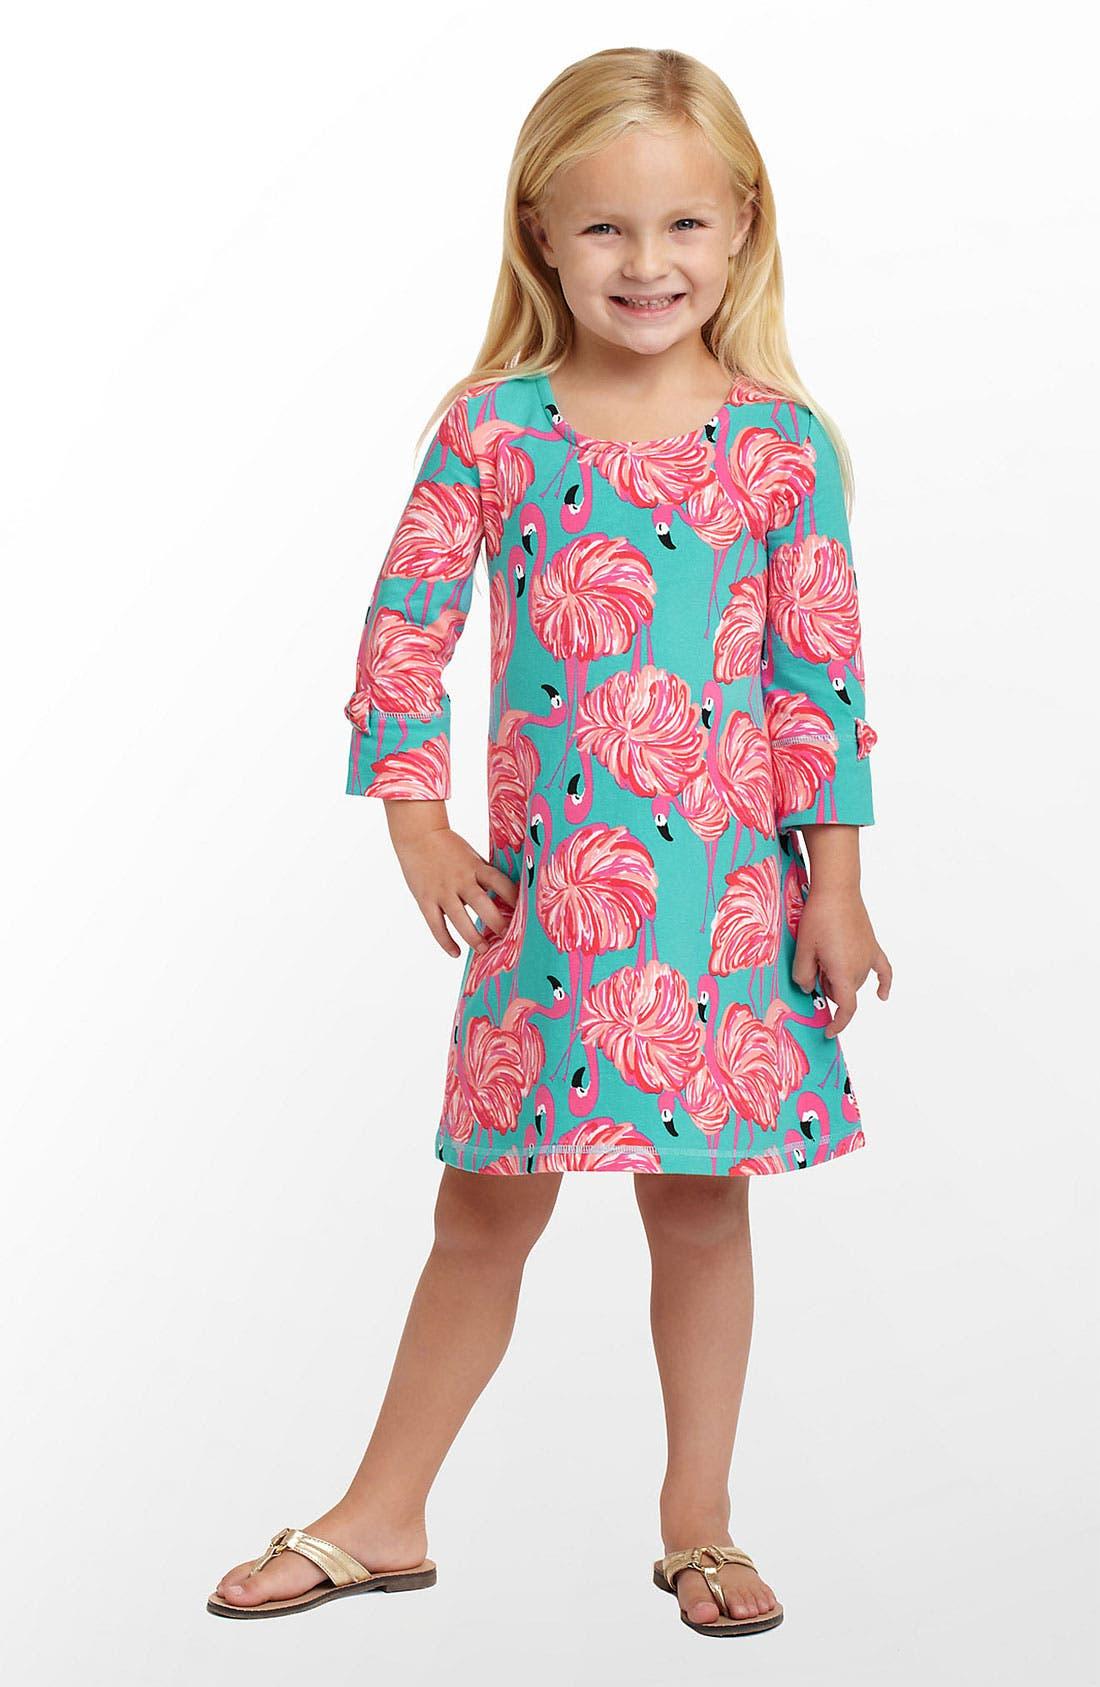 Main Image - Lilly Pulitzer® 'Primm' Knit Dress (Little Girls & Big Girls)